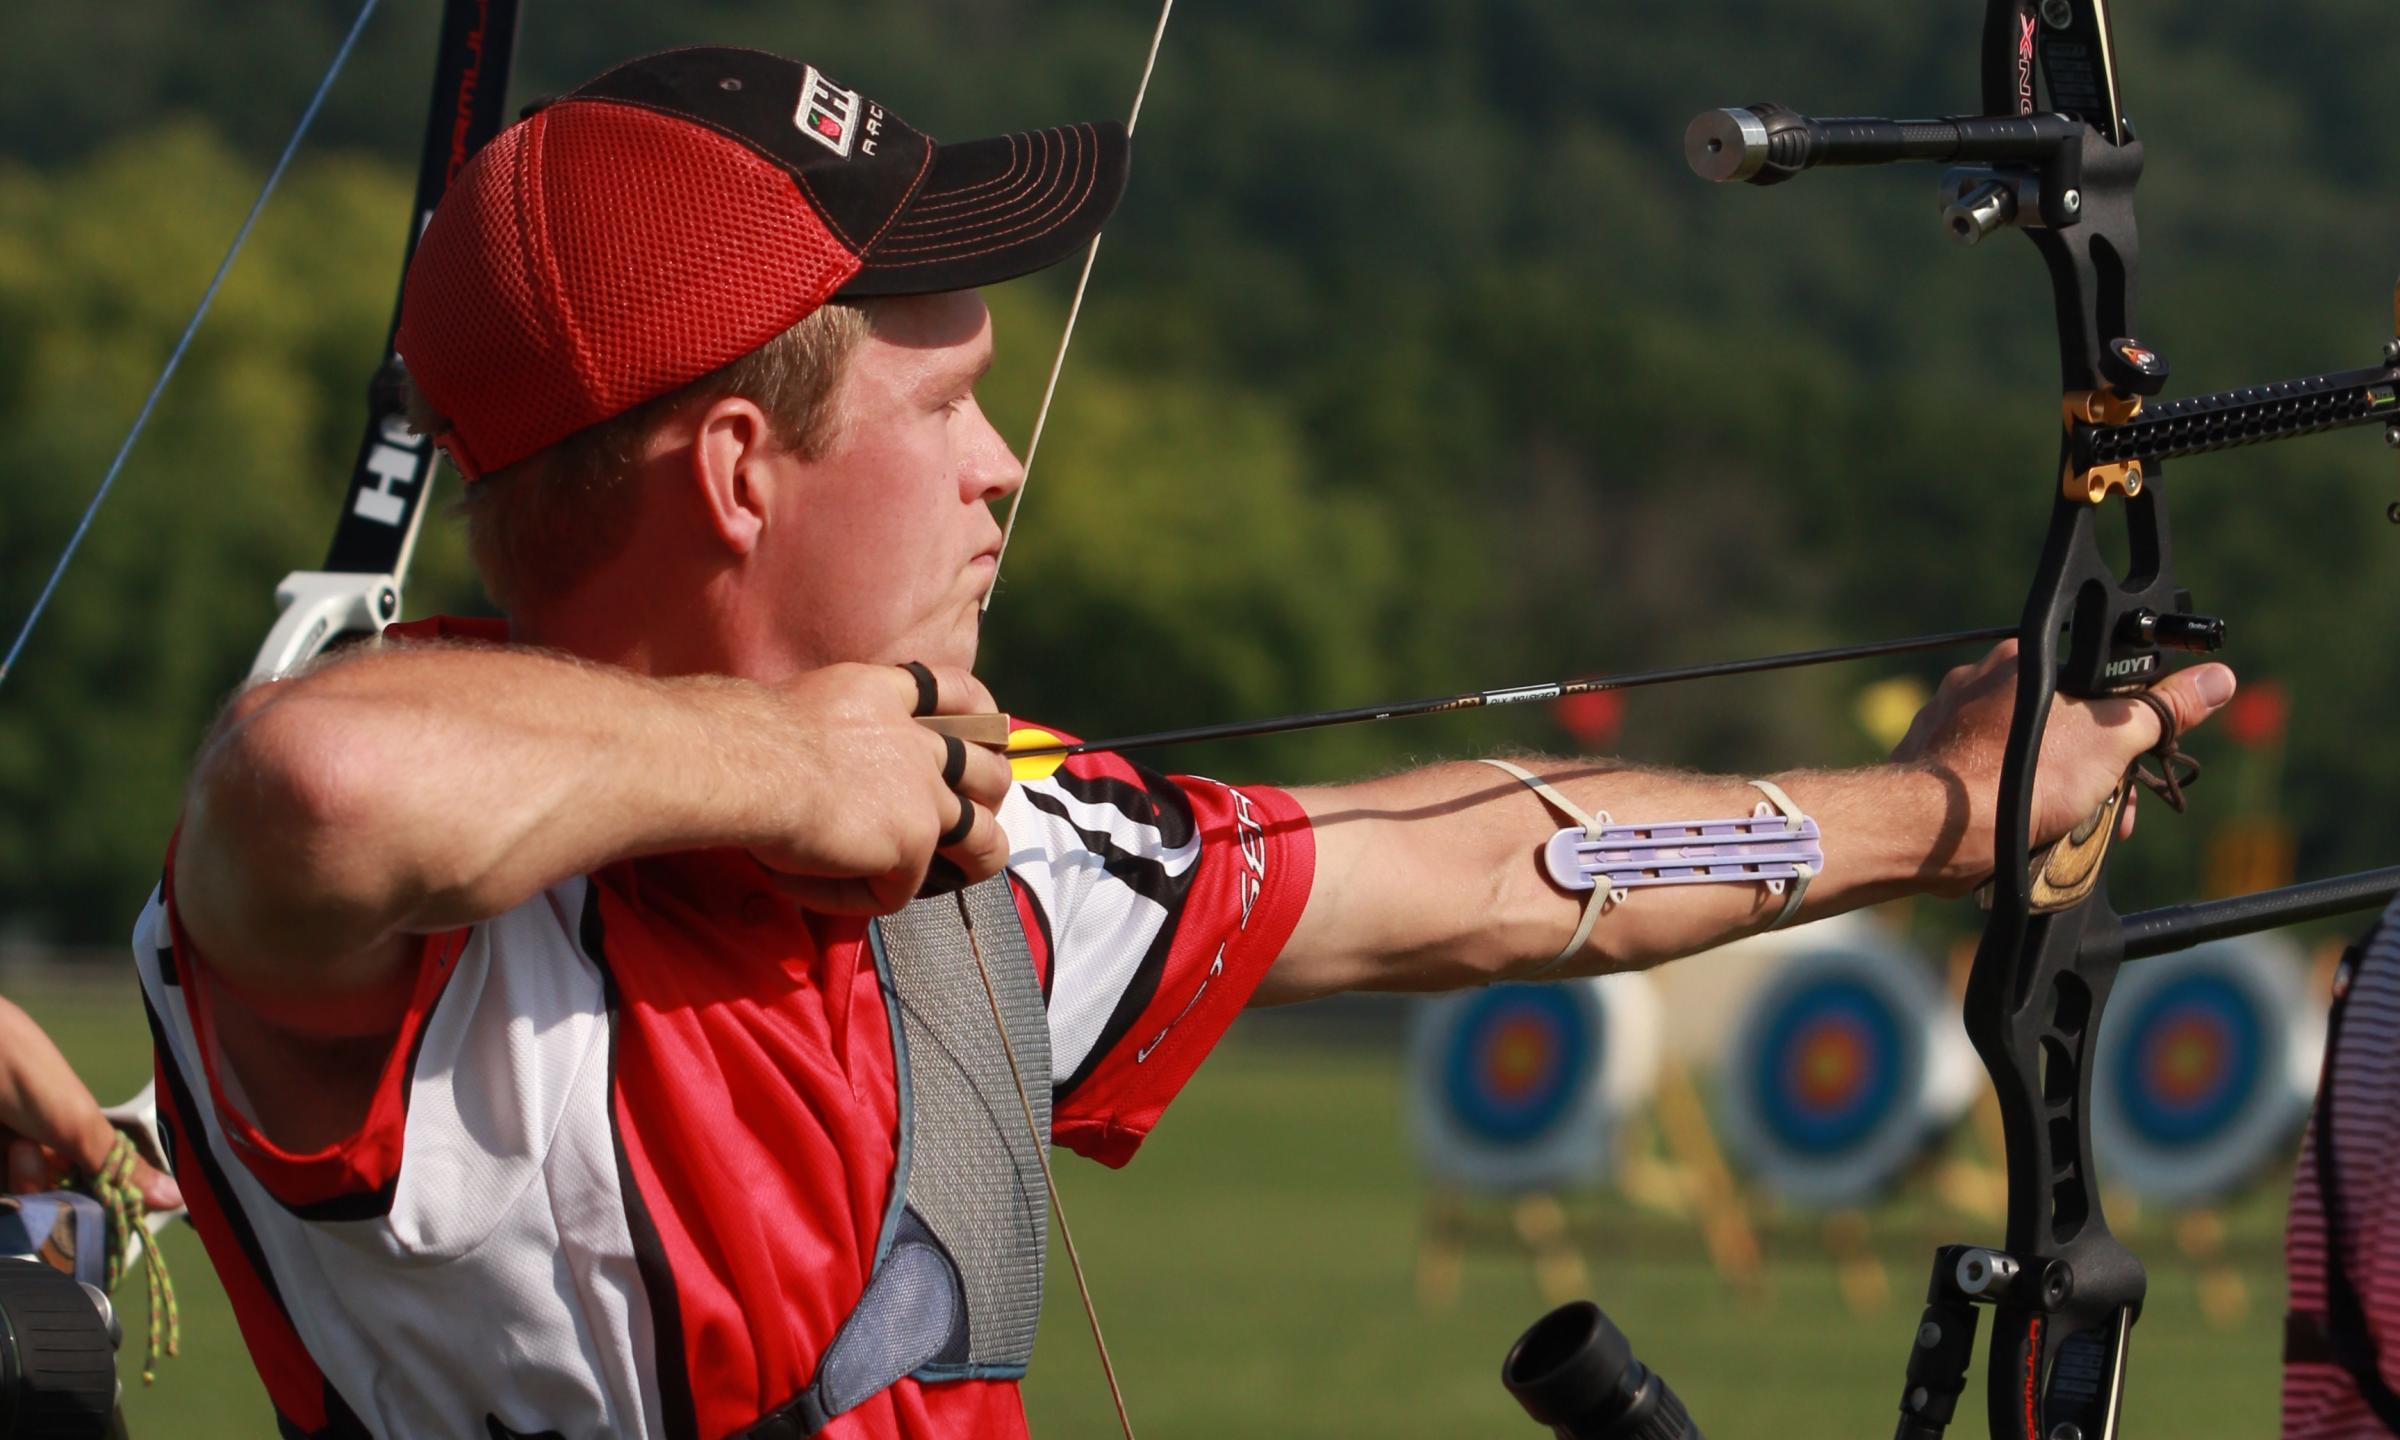 competitive archery